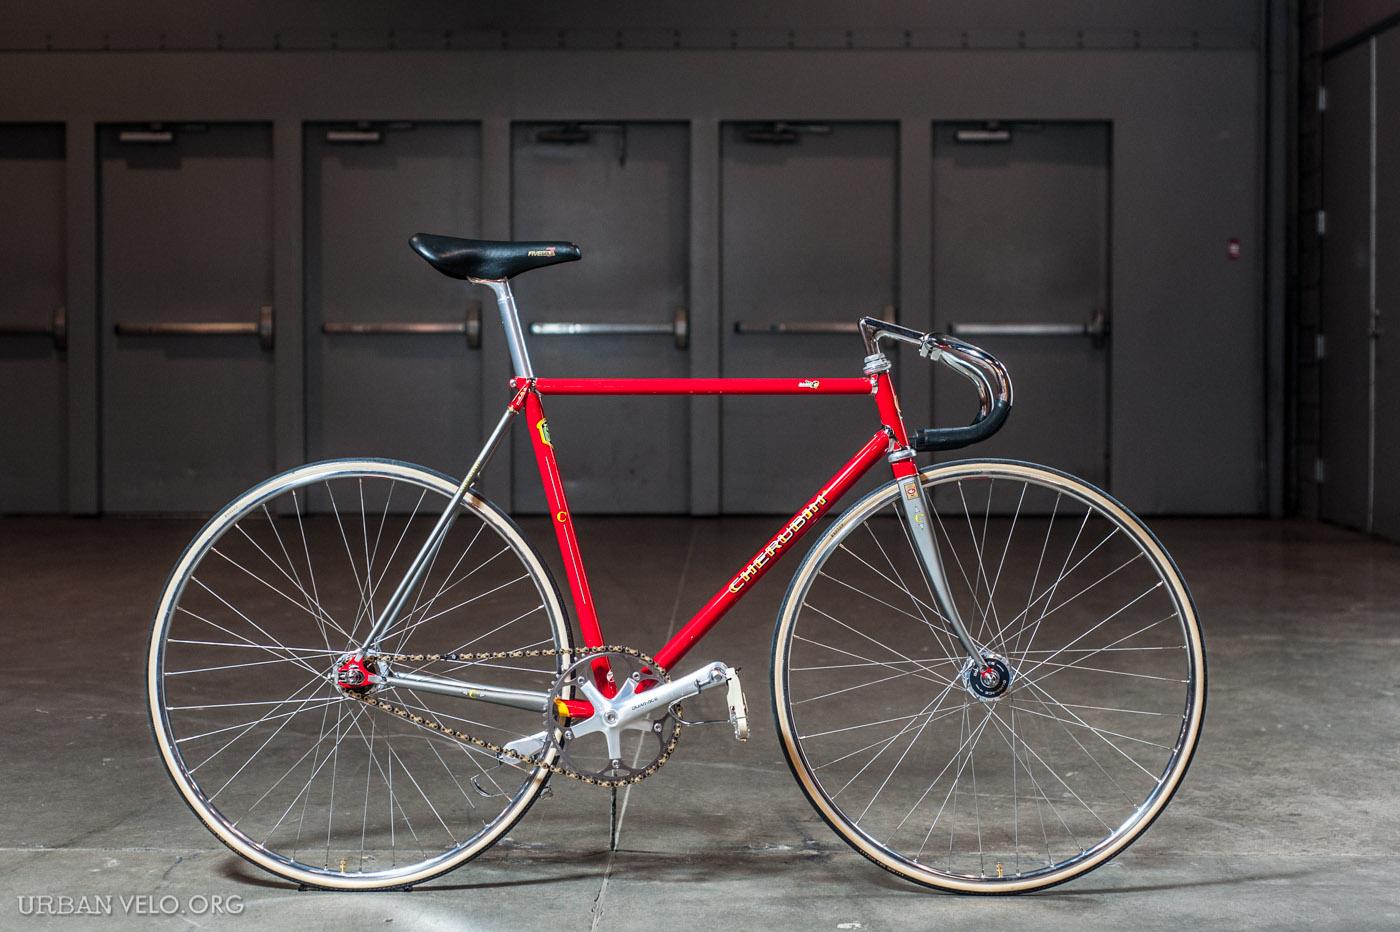 Cherubim Njs Track Bike At Nahbs Urban Velo